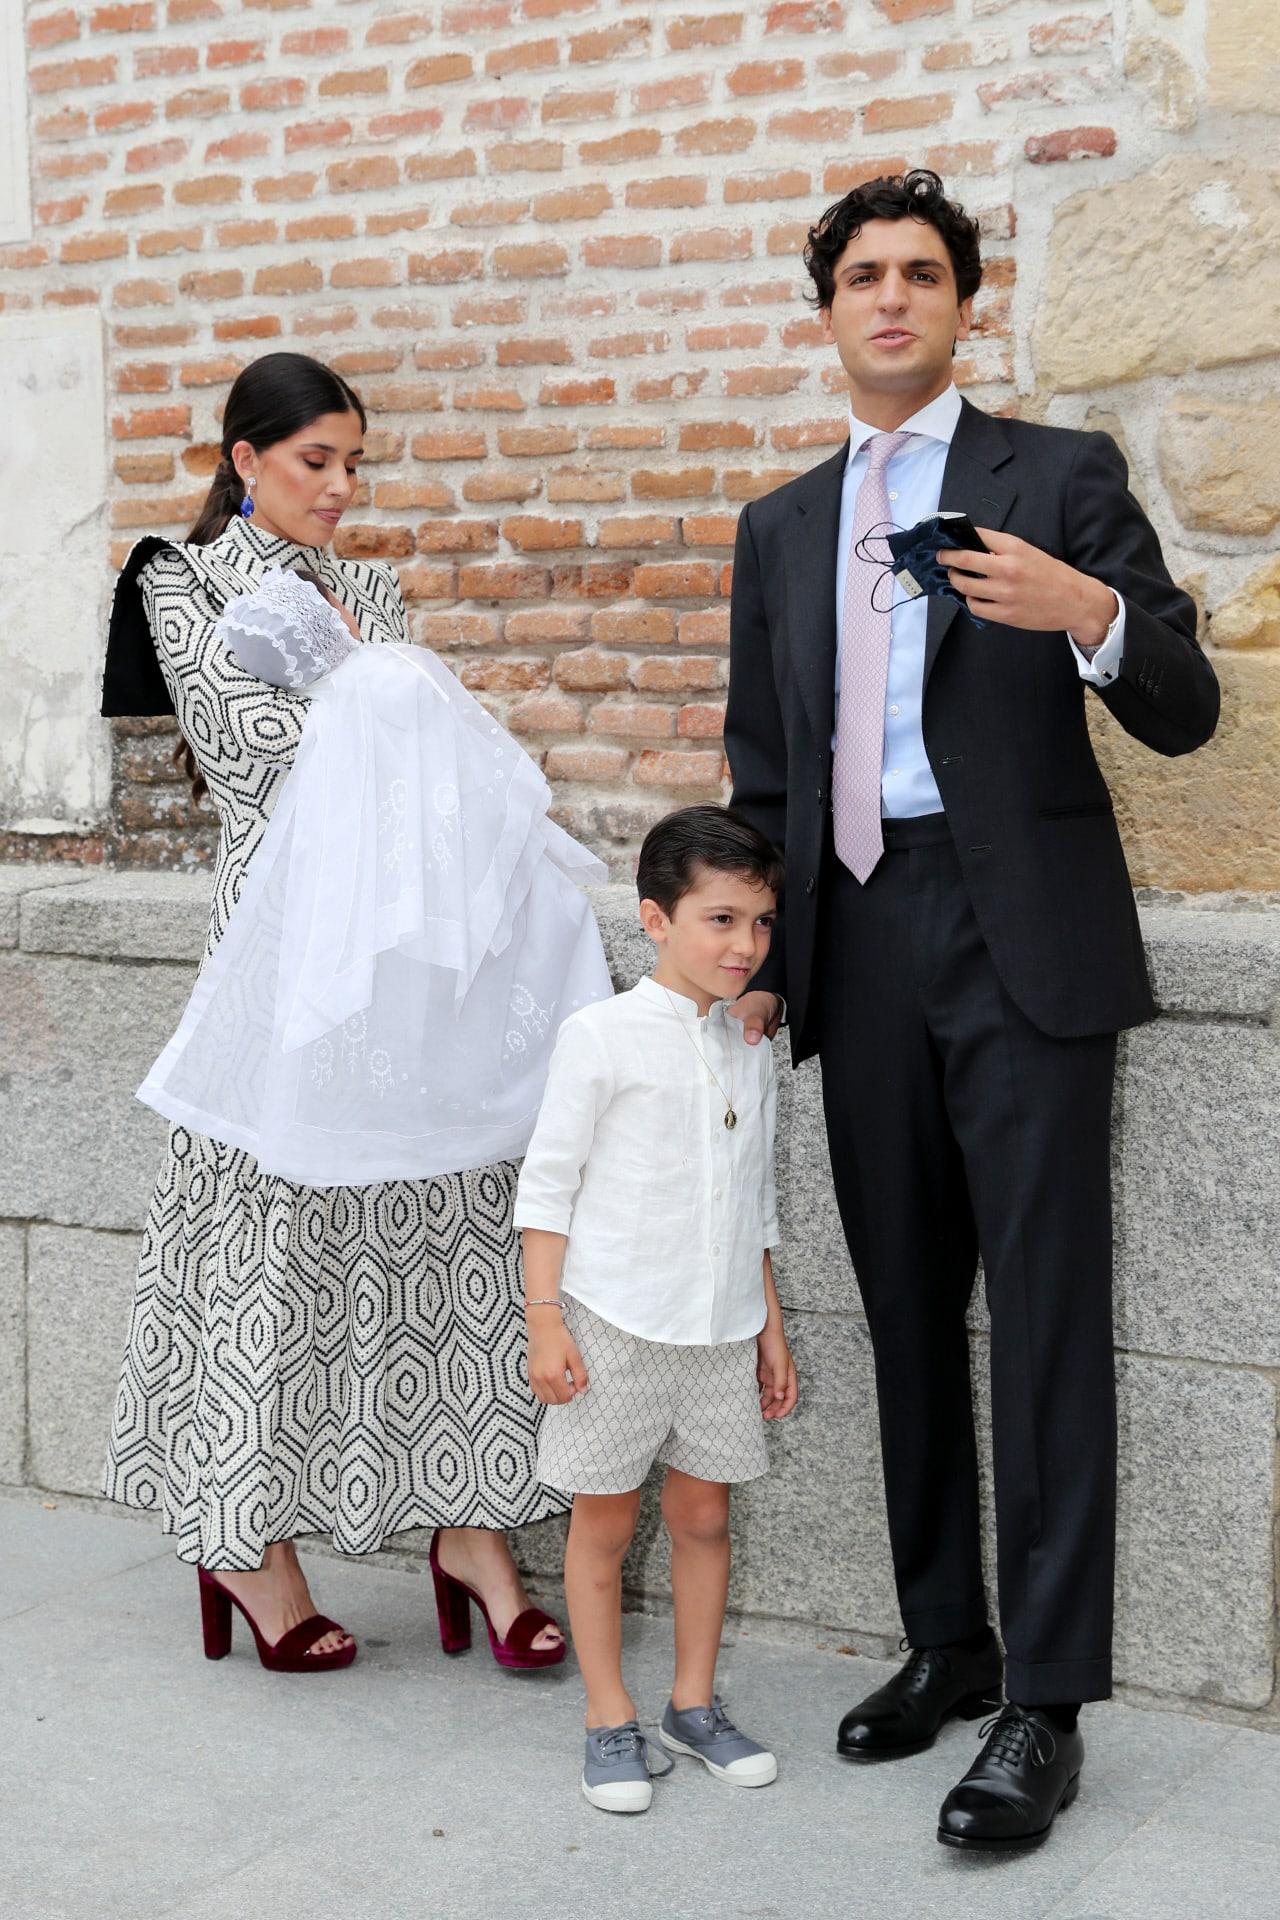 Maria de Jaime and Tomas Paramo  bautizo de ines domecq